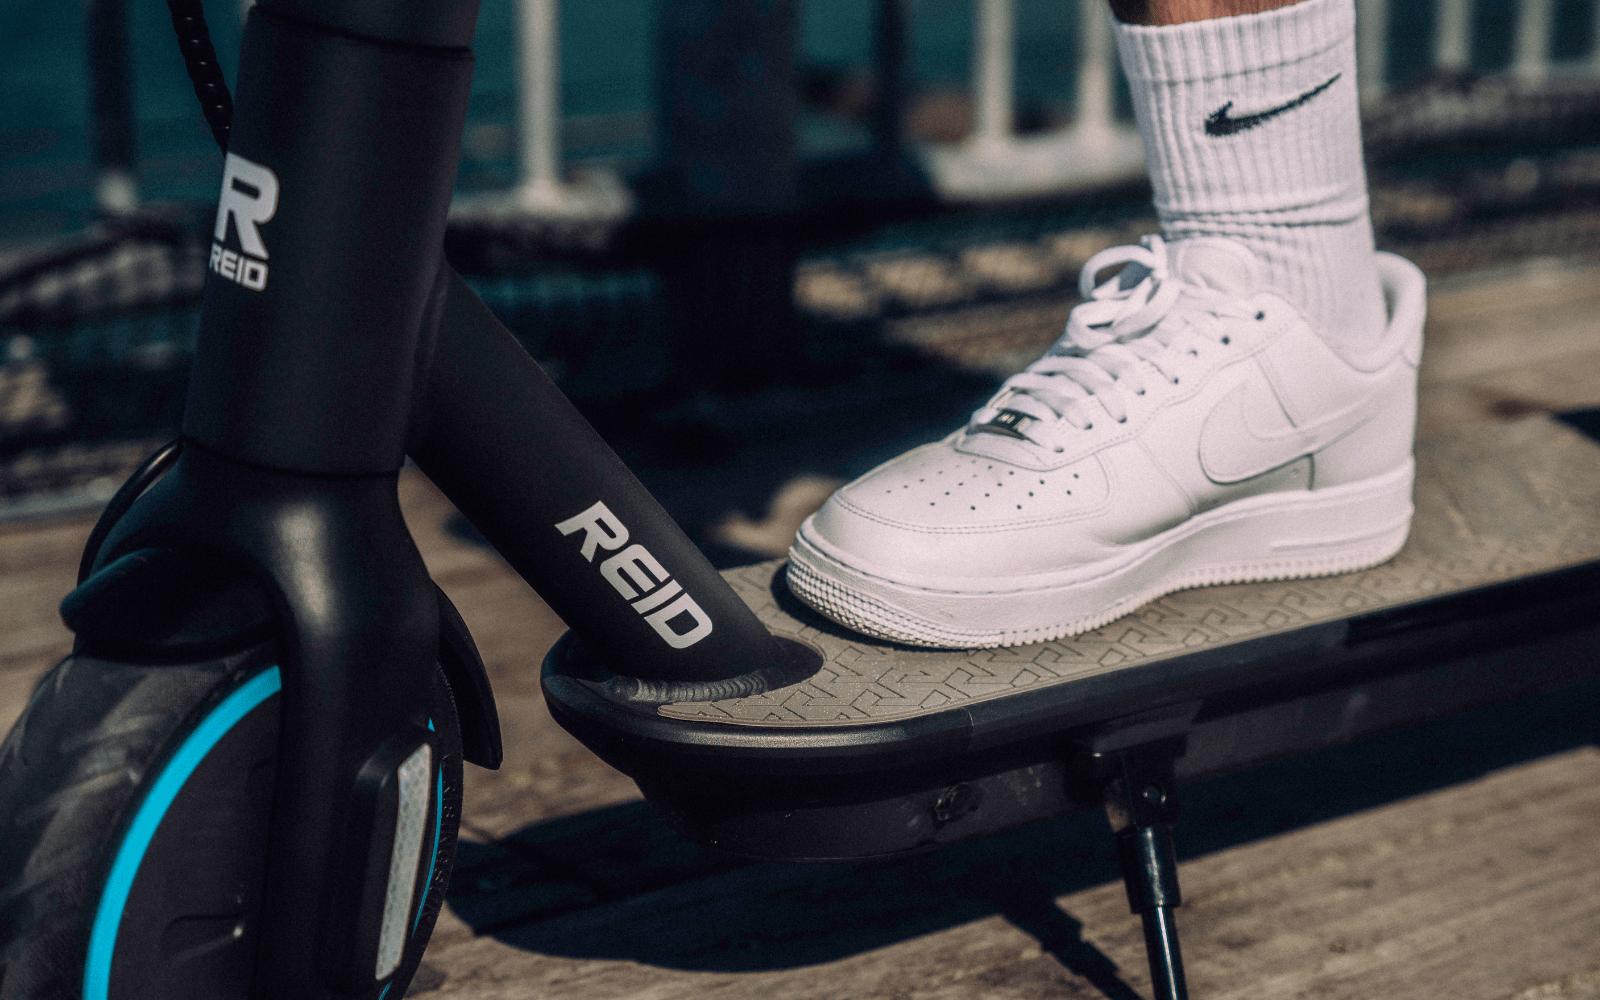 2 54 - Reid ® - Boost eScooter